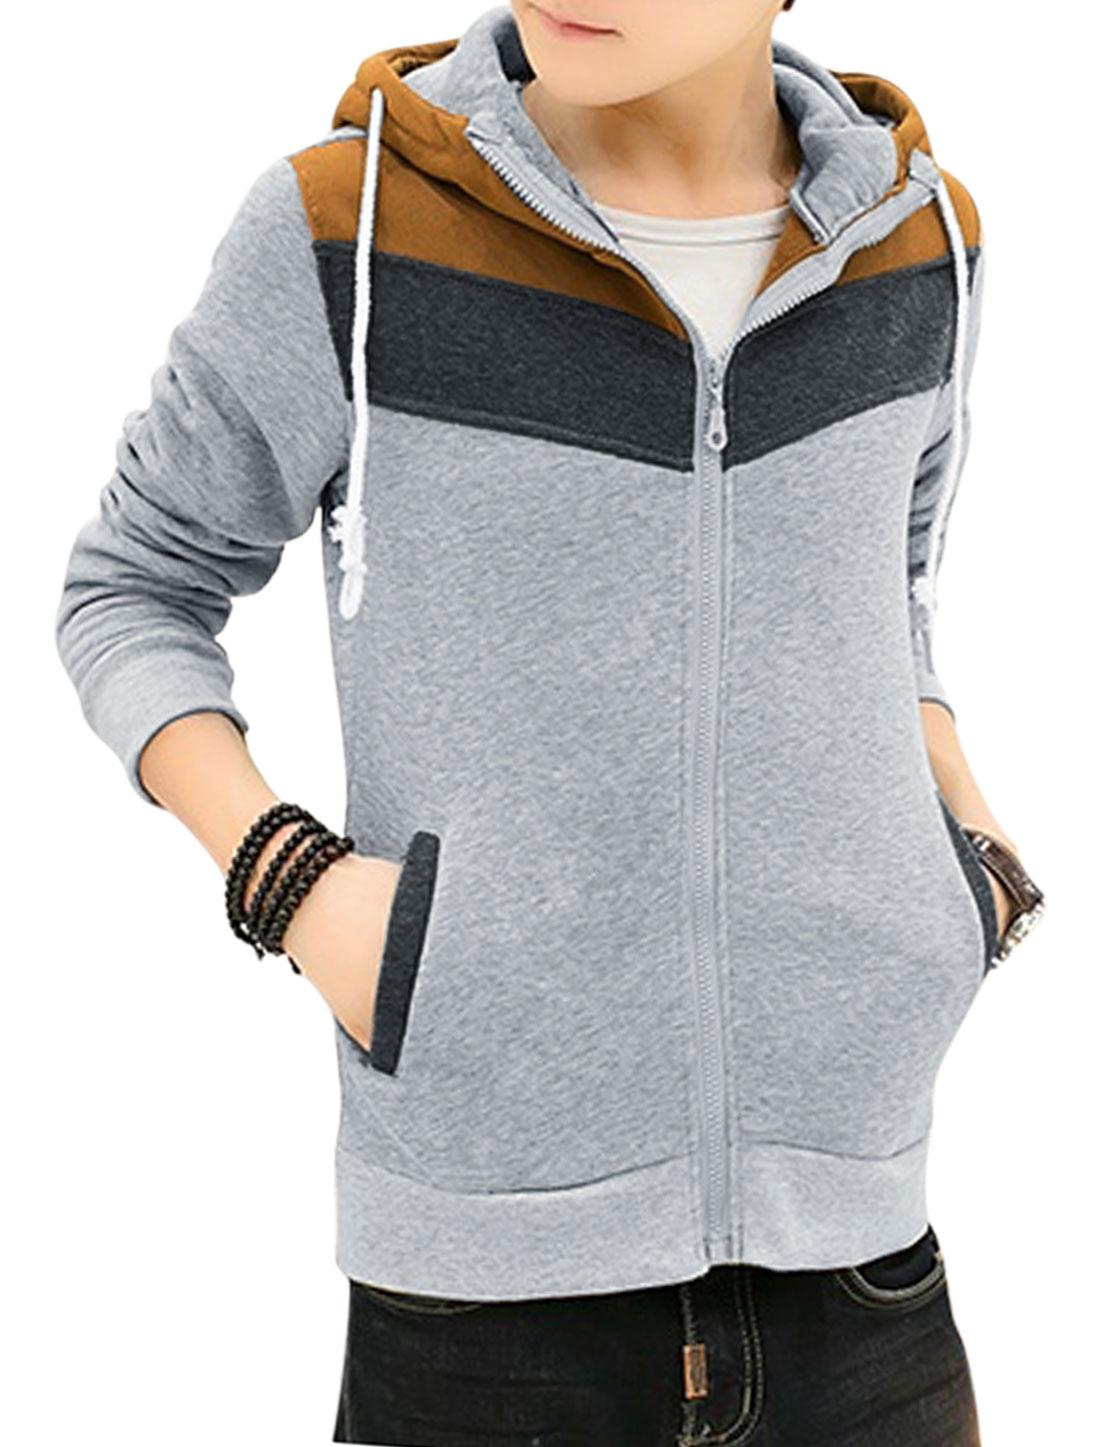 Men Zip Closure Contrast Color Front Pockets Casual Hoodie Jacket Light Gray M